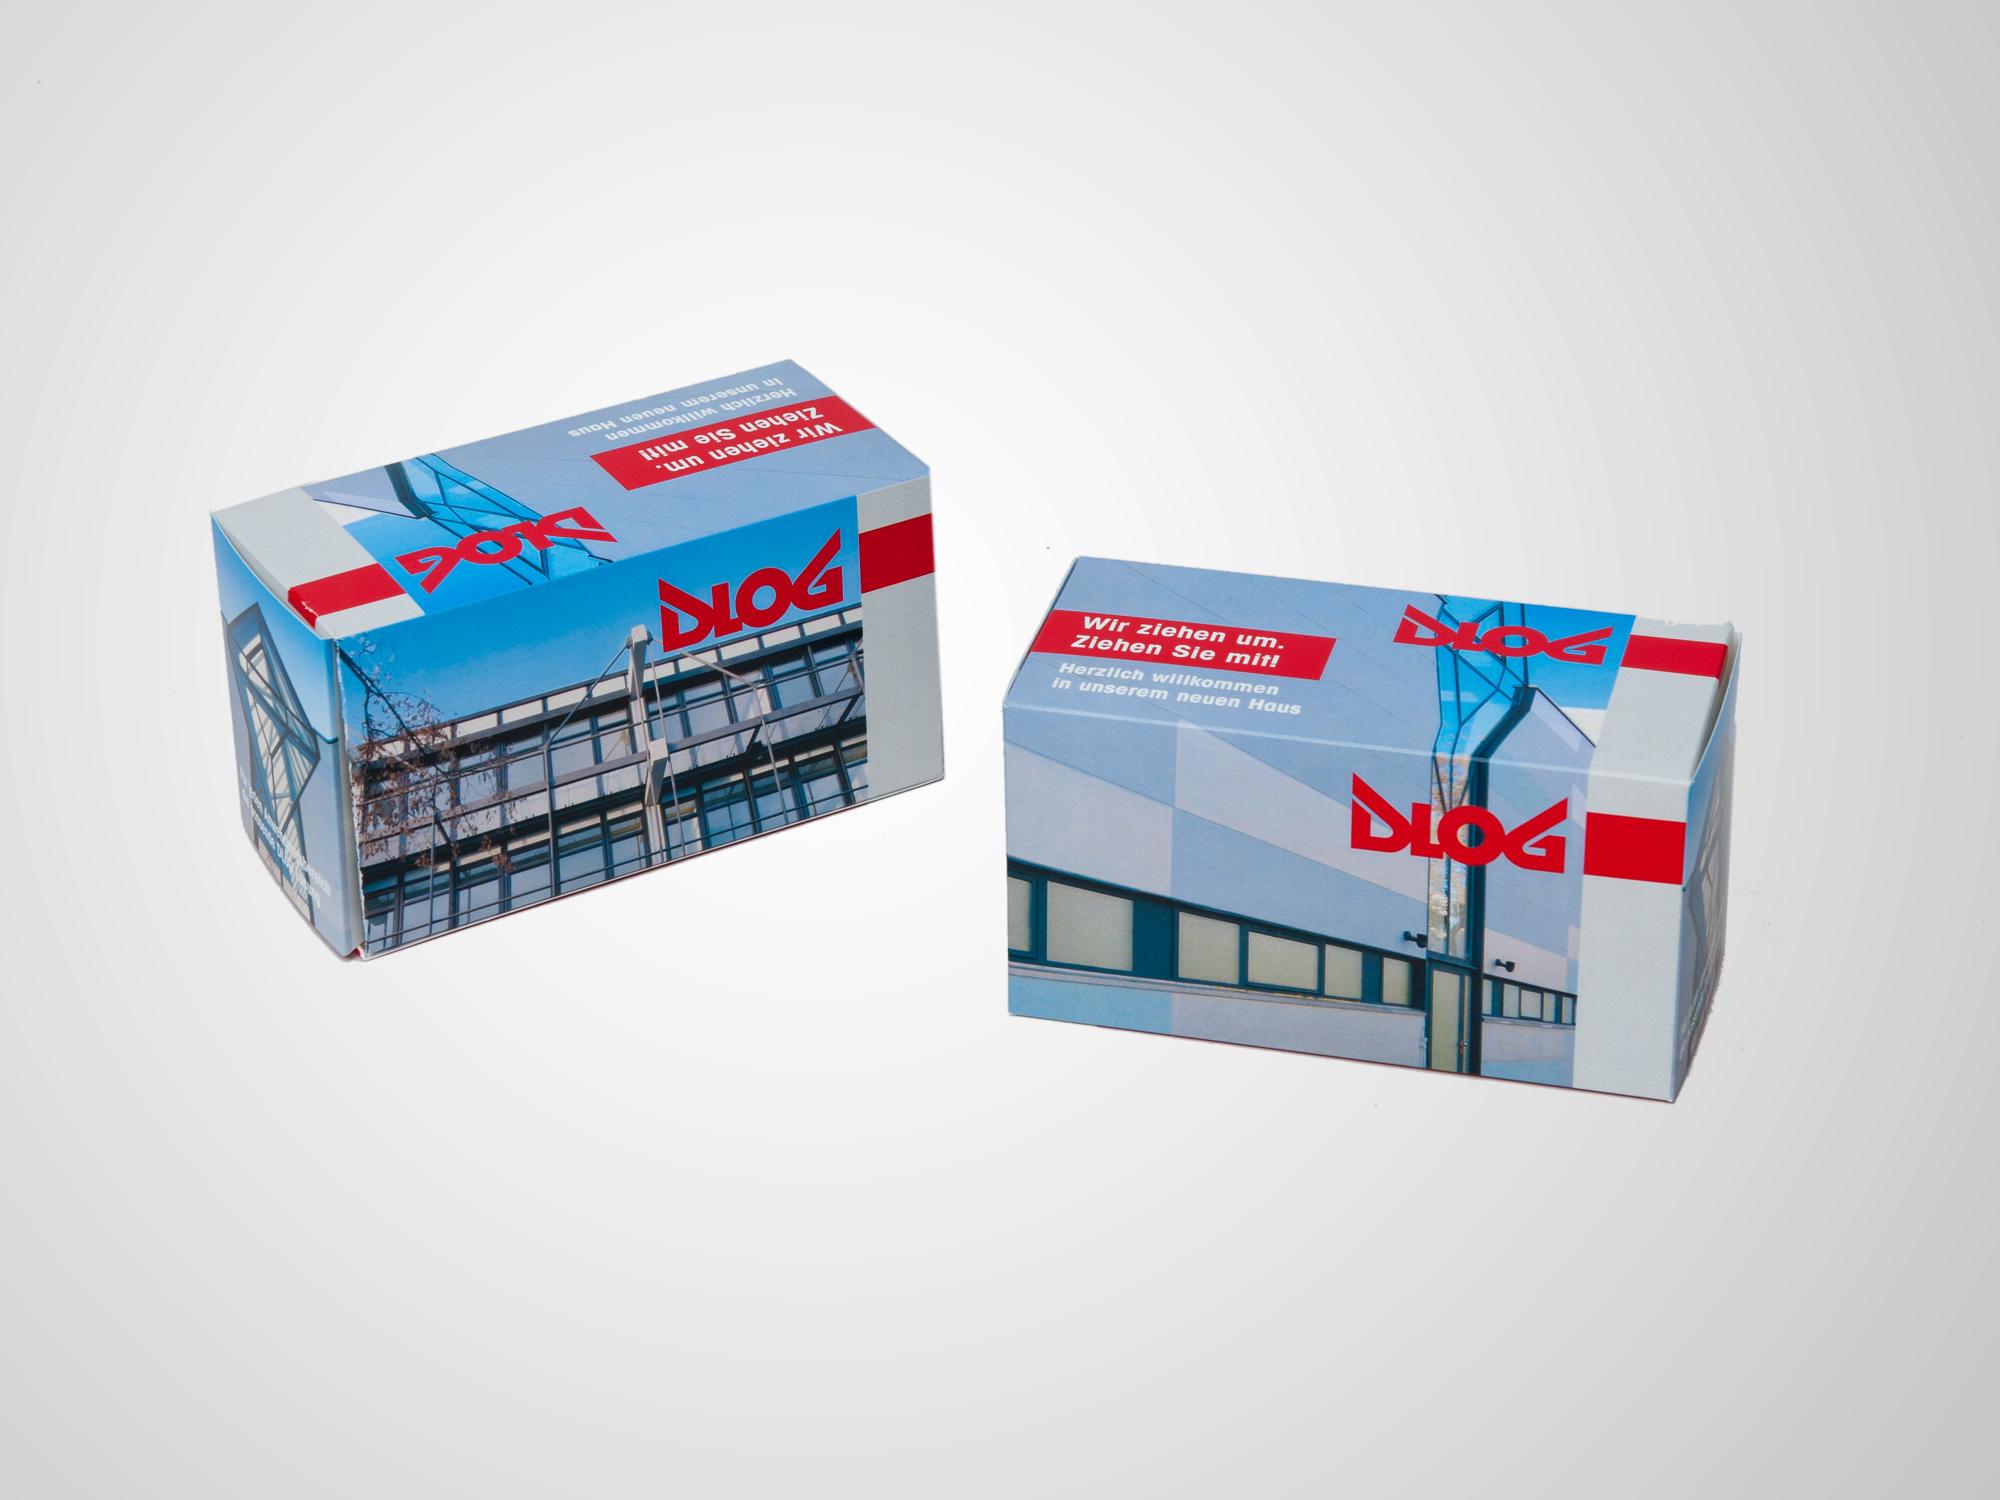 Design-Verpackung-DLoG